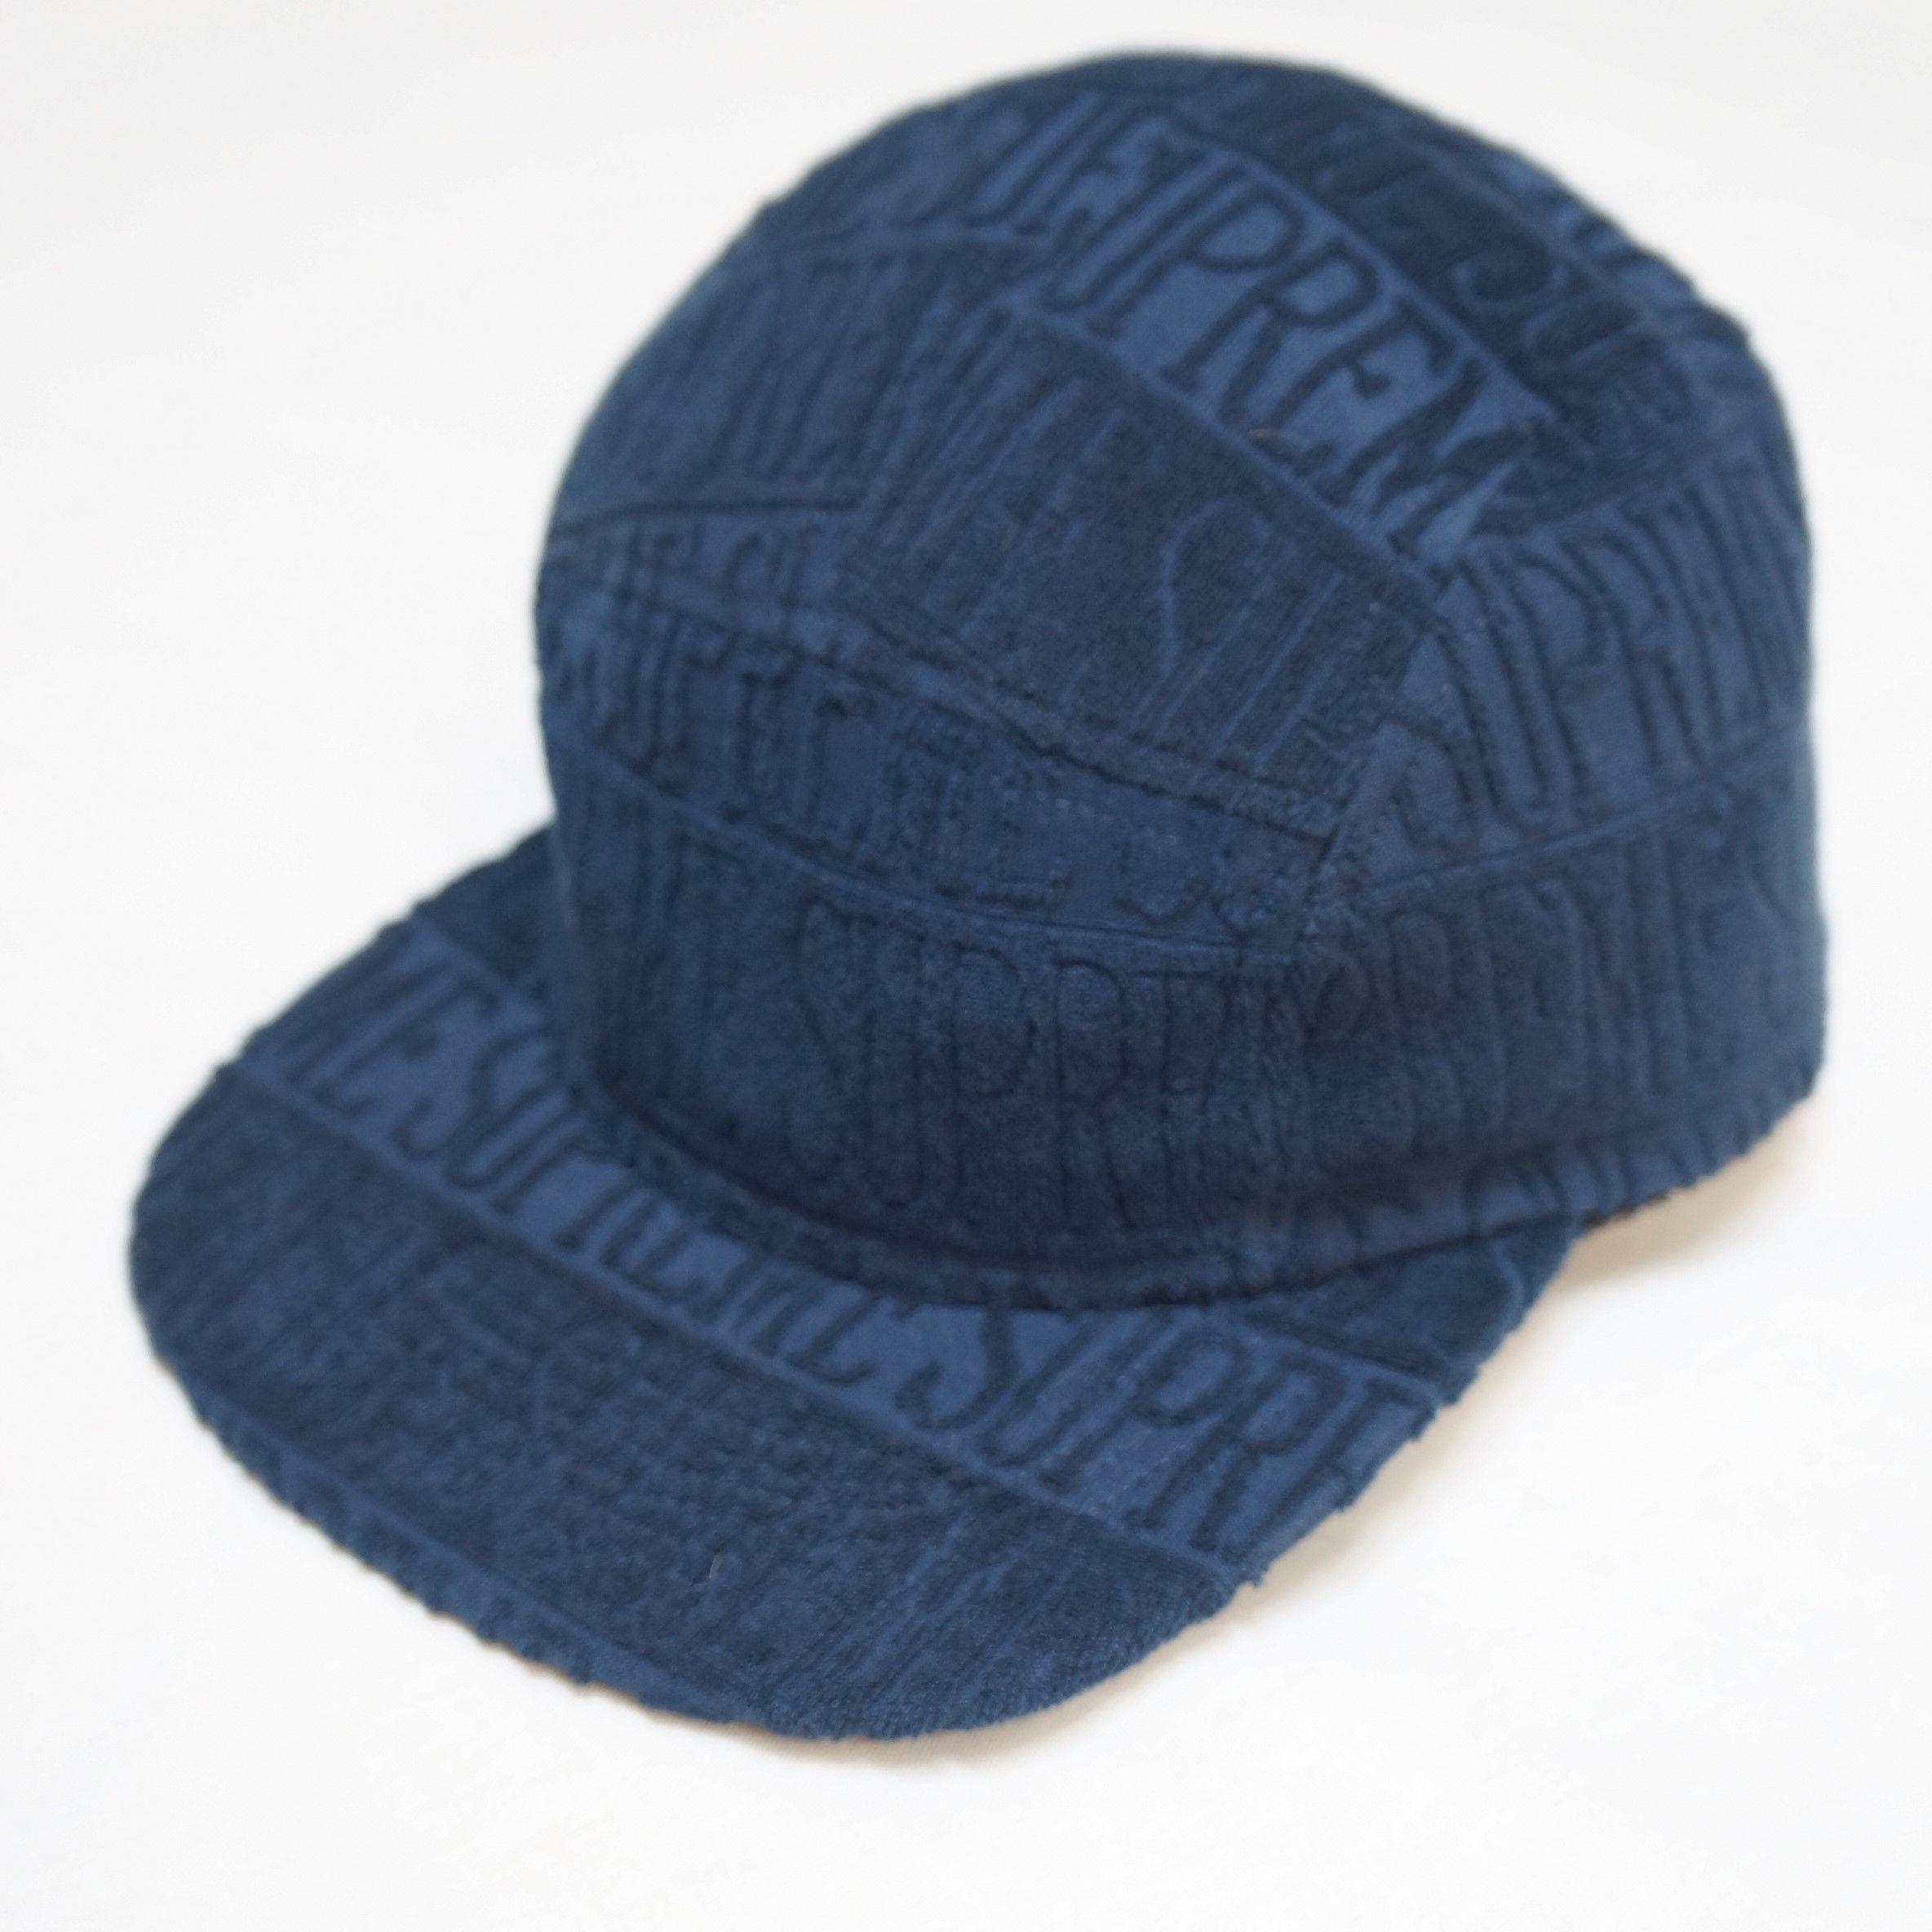 SUPREME CAP Navy Text Stripe Terry